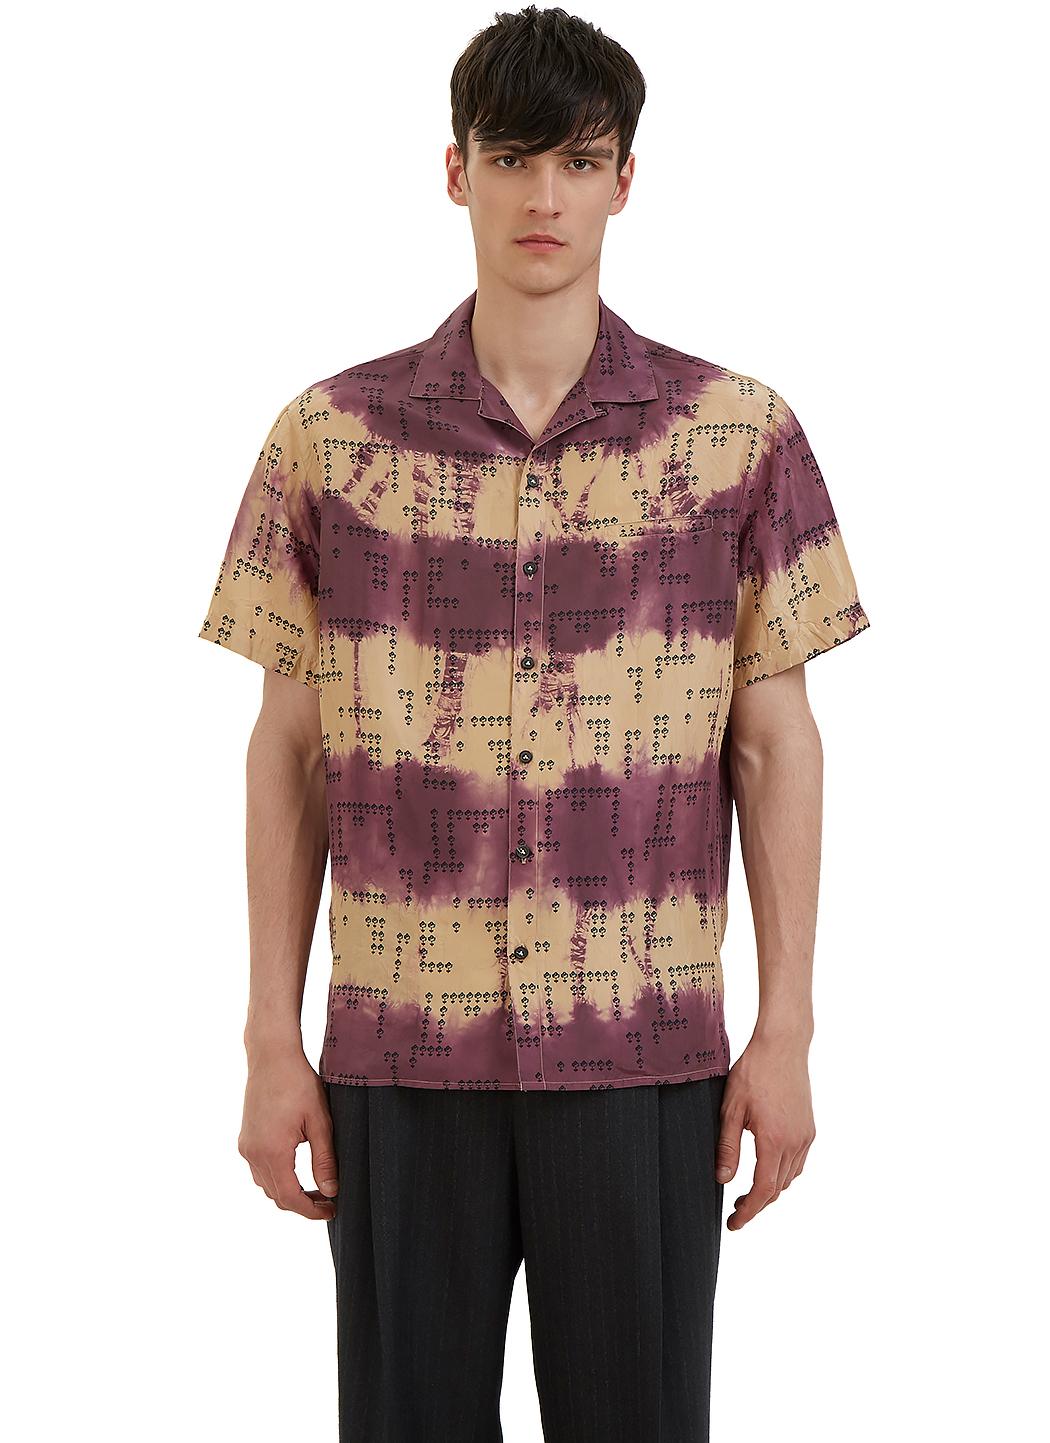 Lanvin men 39 s tie dye floral printed bowling shirt in for Tie dye printed shirts